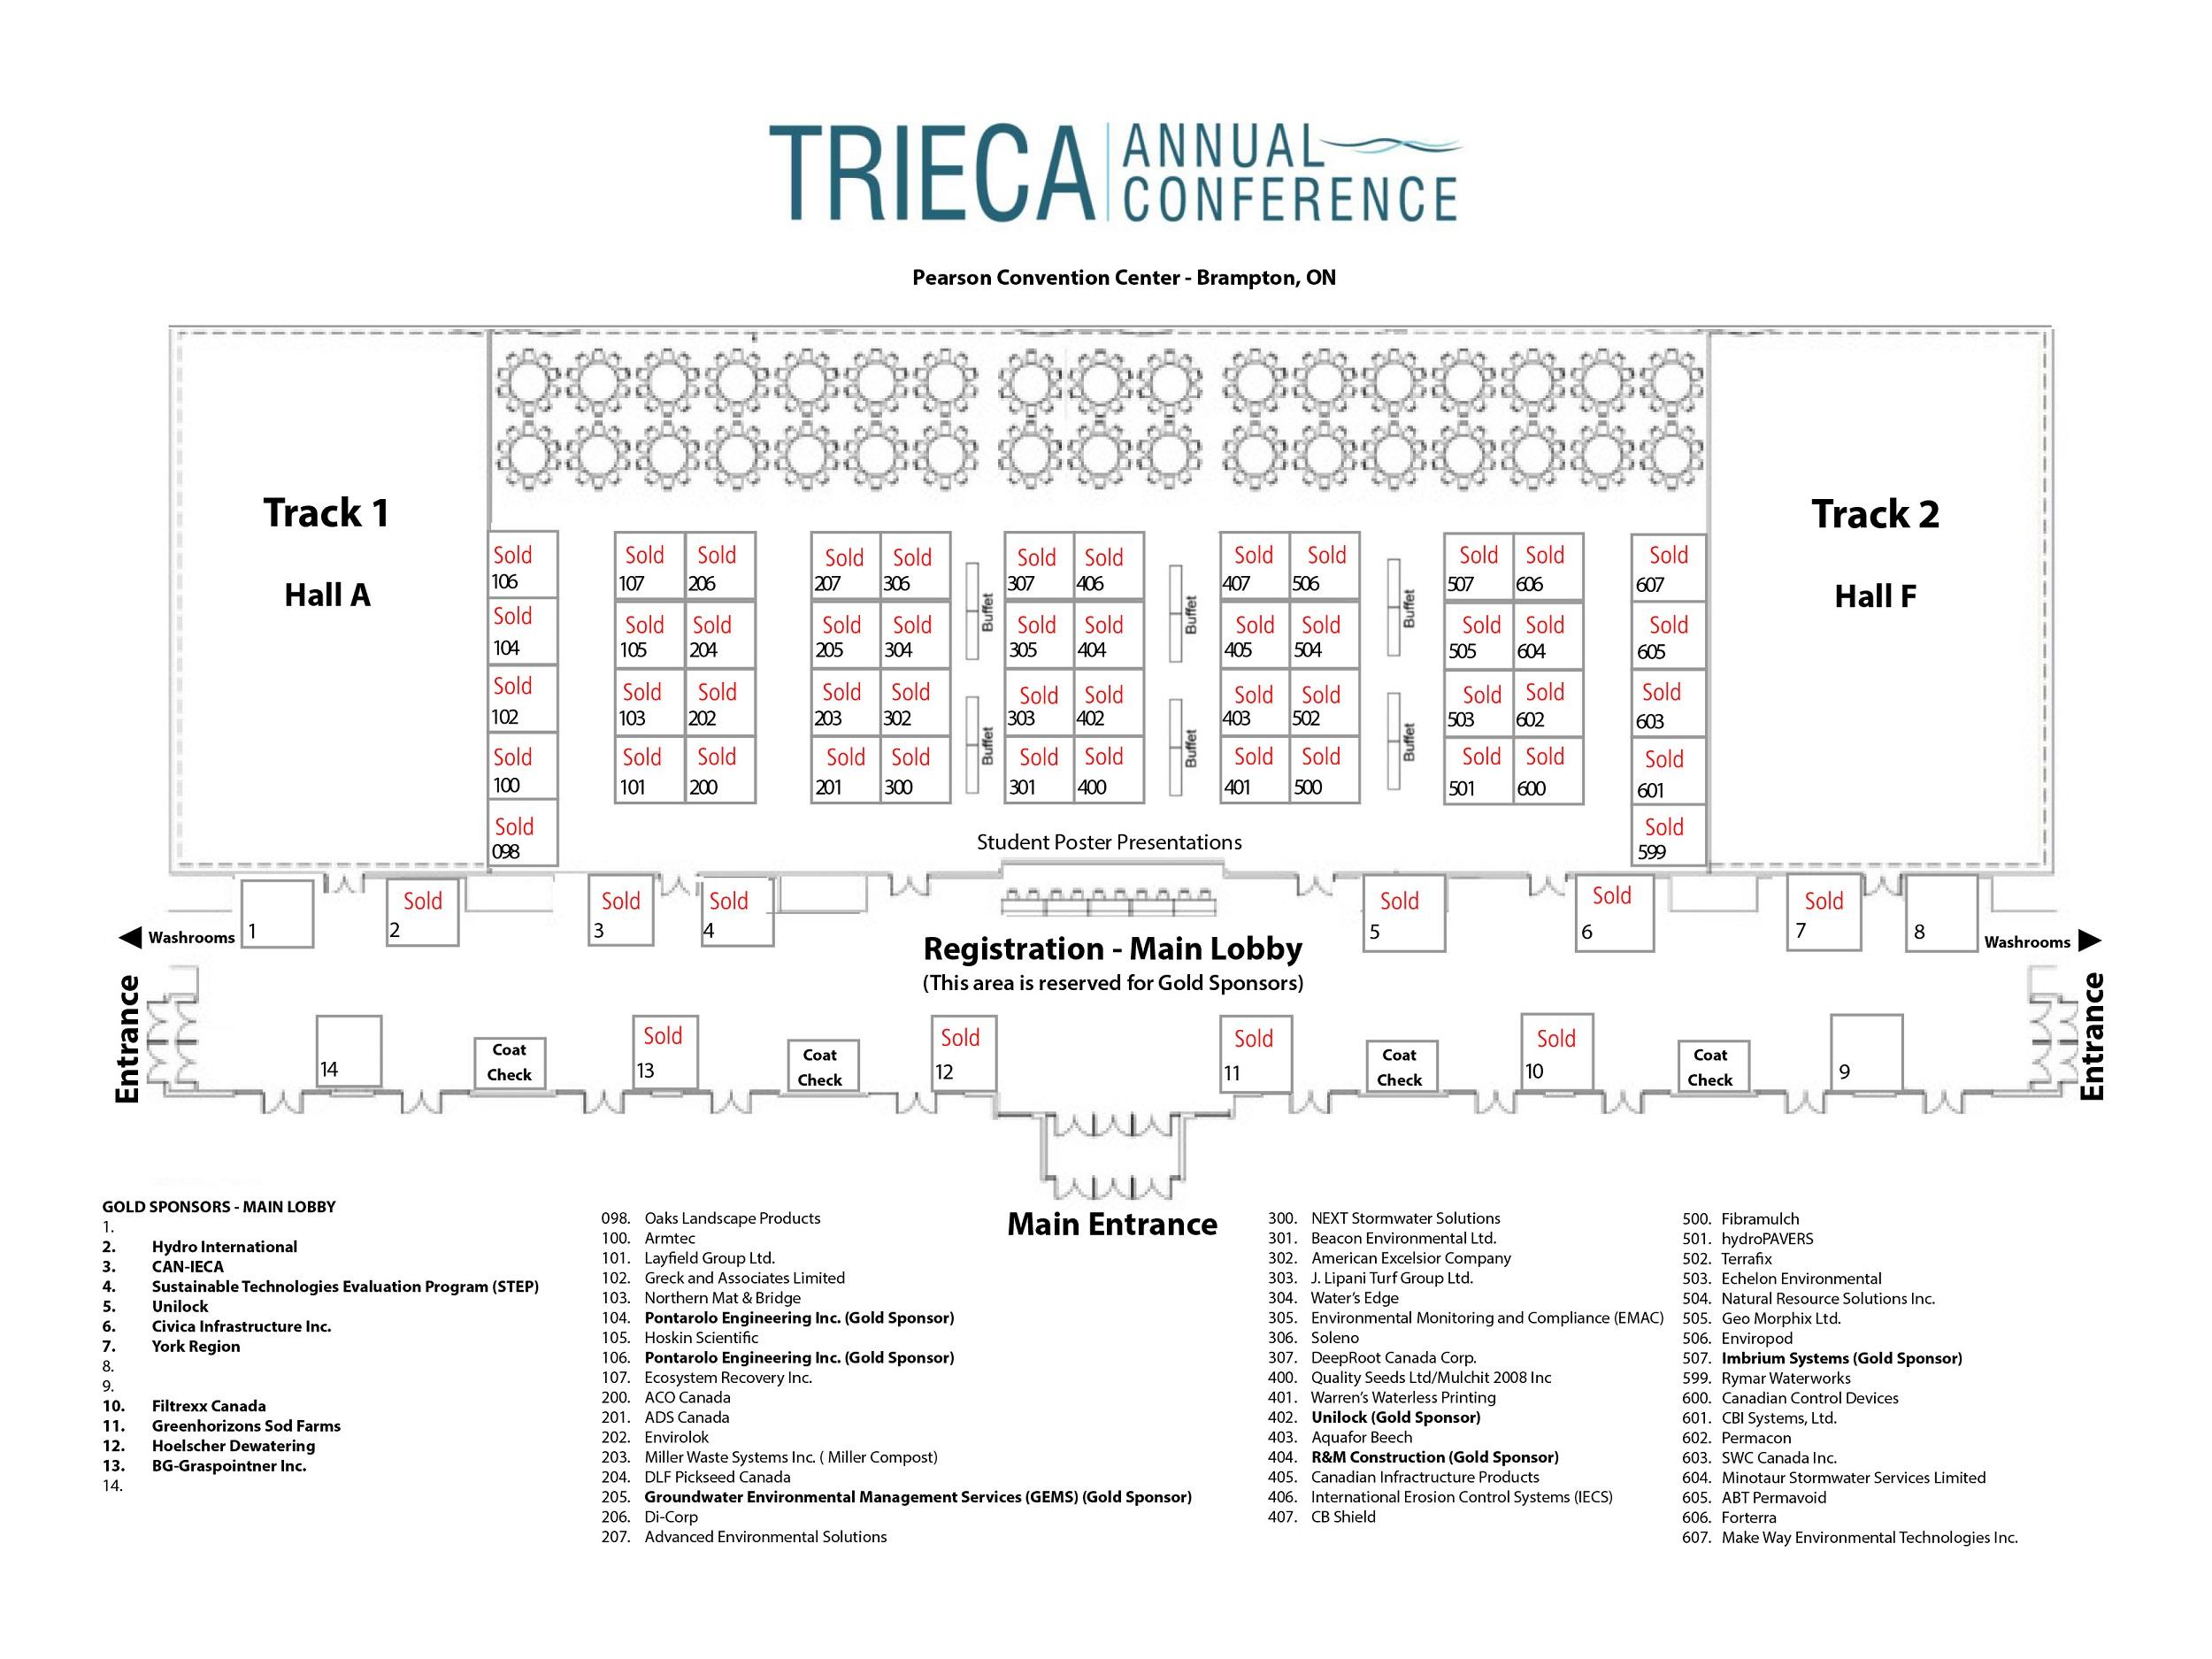 TRIECA 2020 conference floor plan